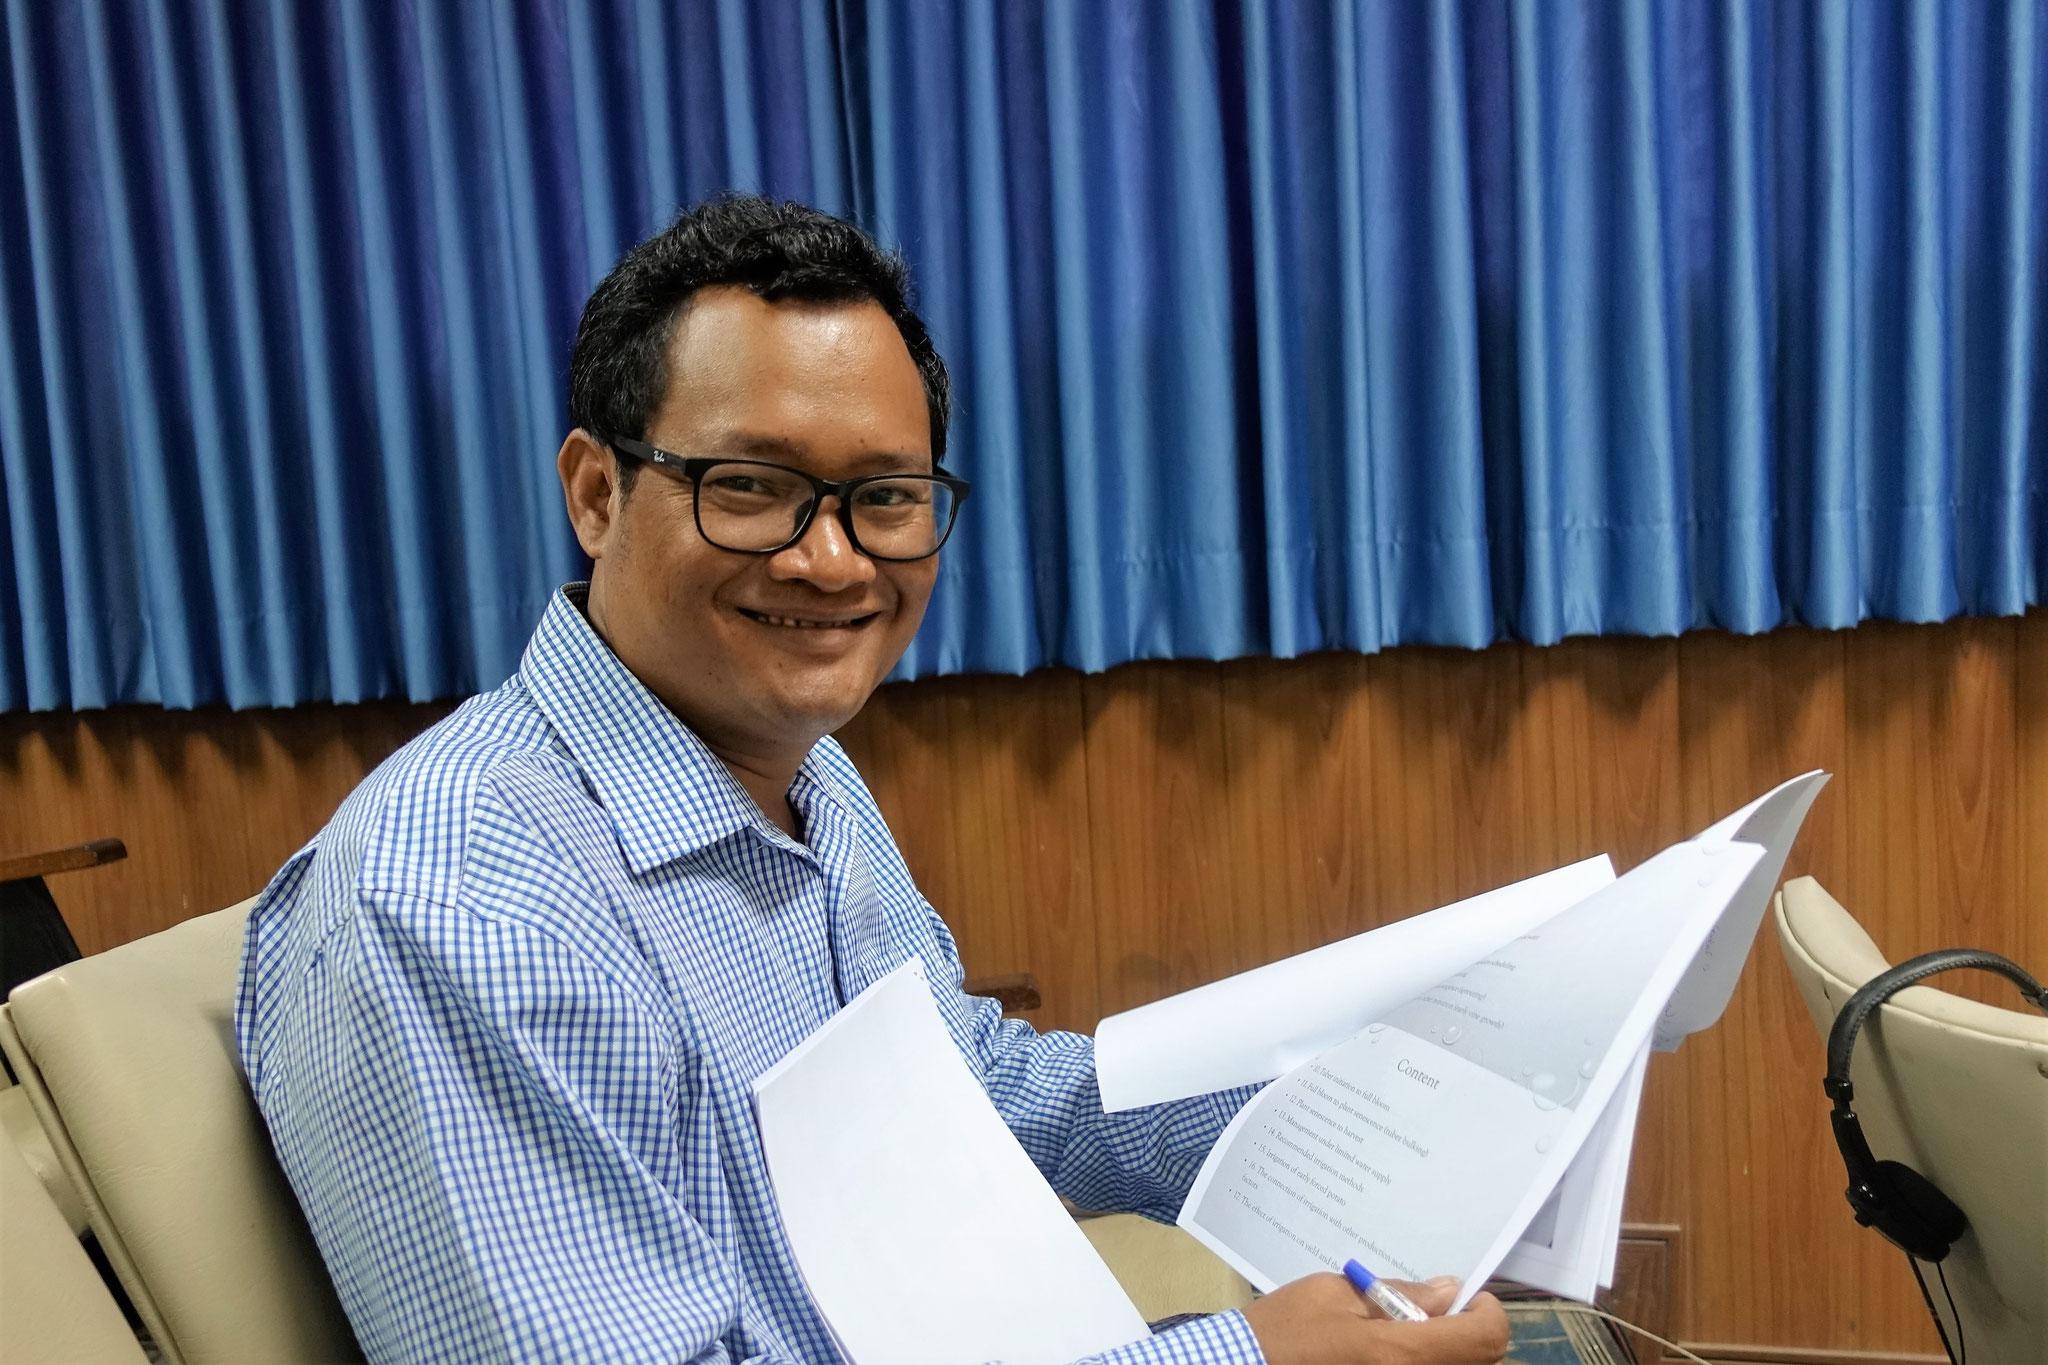 Neth Prak, Gründer von BIPA (Bunong Indigenous People's Association)